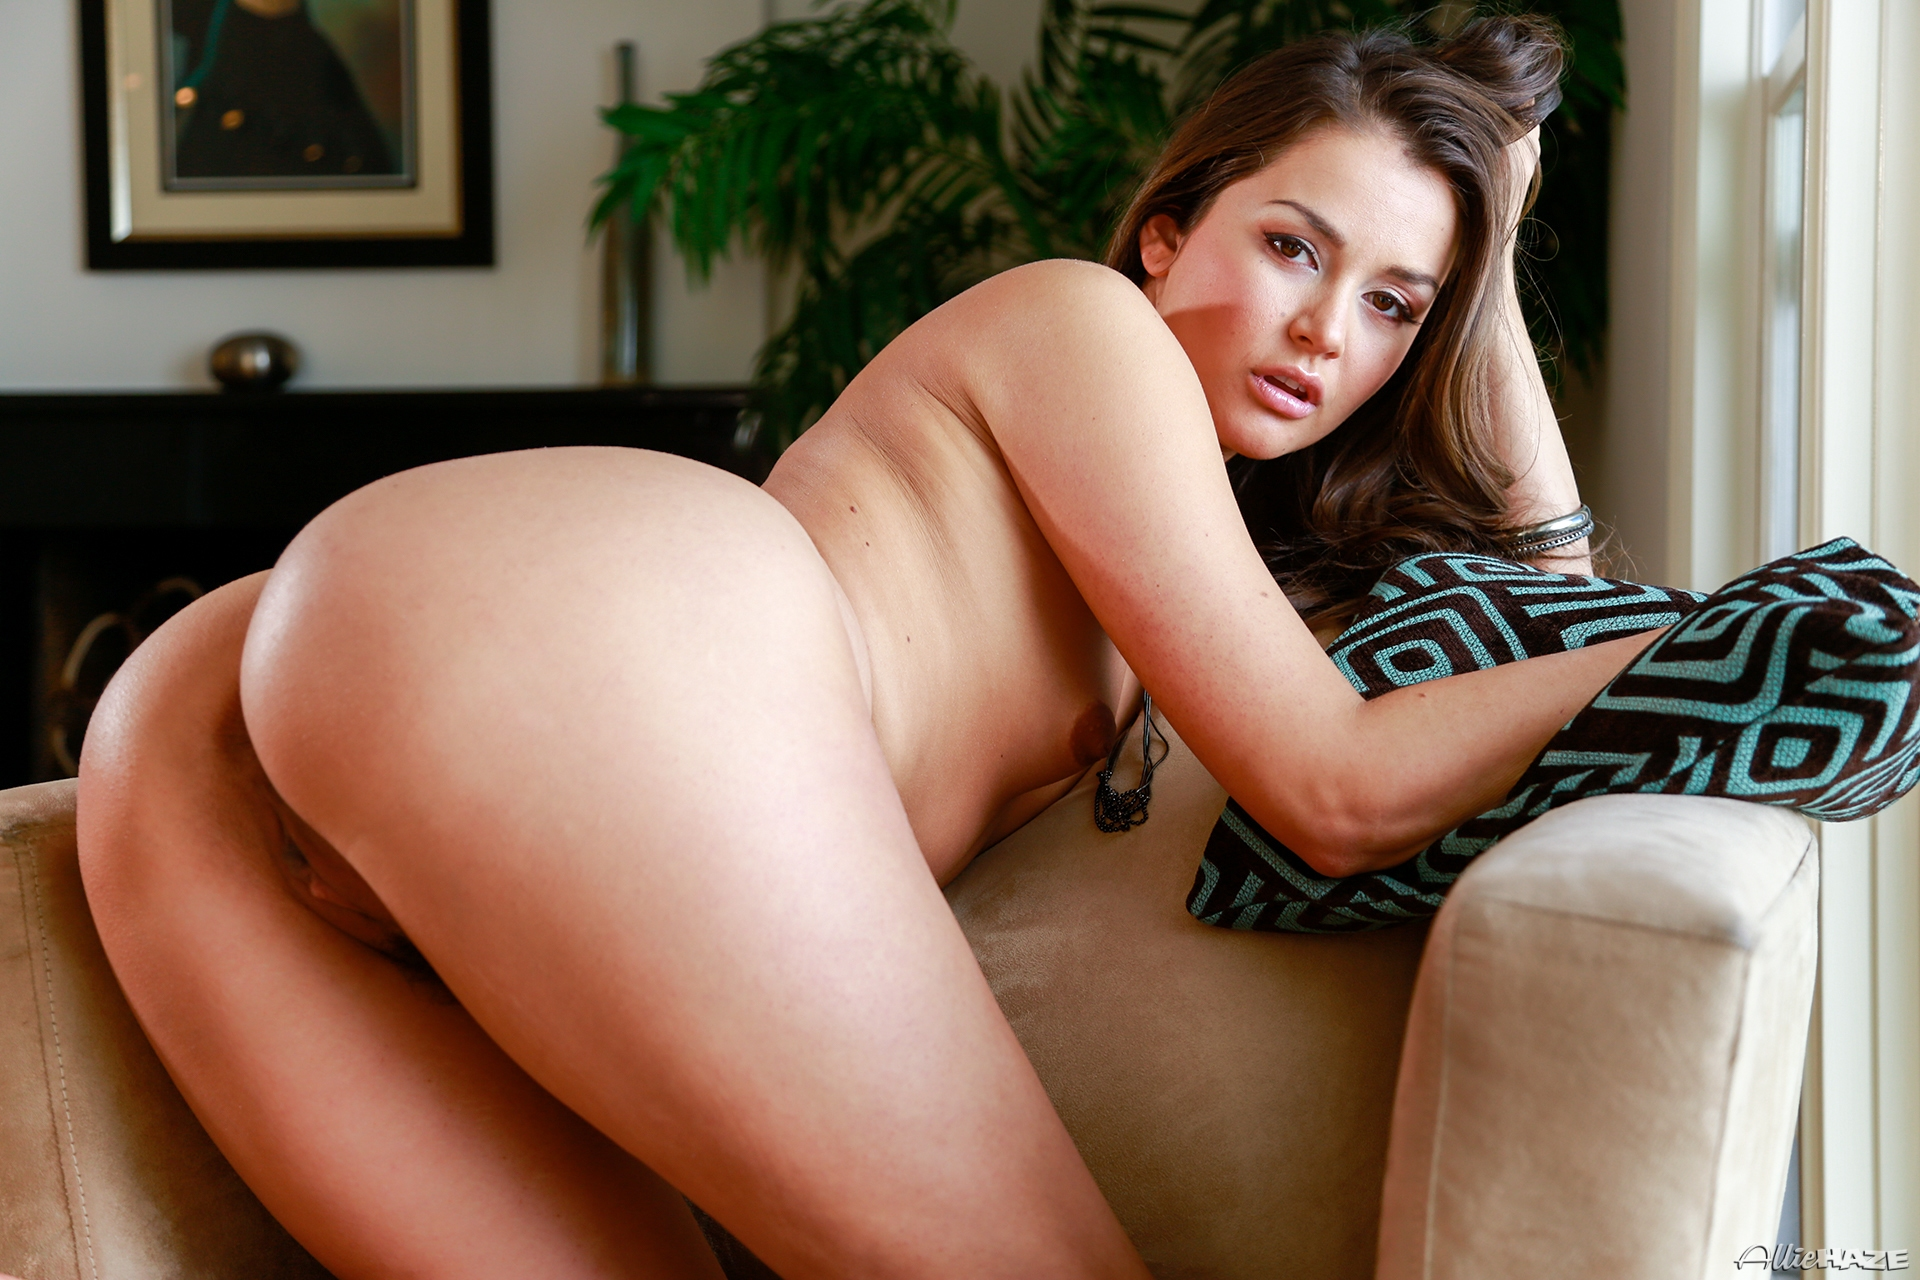 Allie Haze Porn Videos Uploaded allie haze 58863 - good sex porn